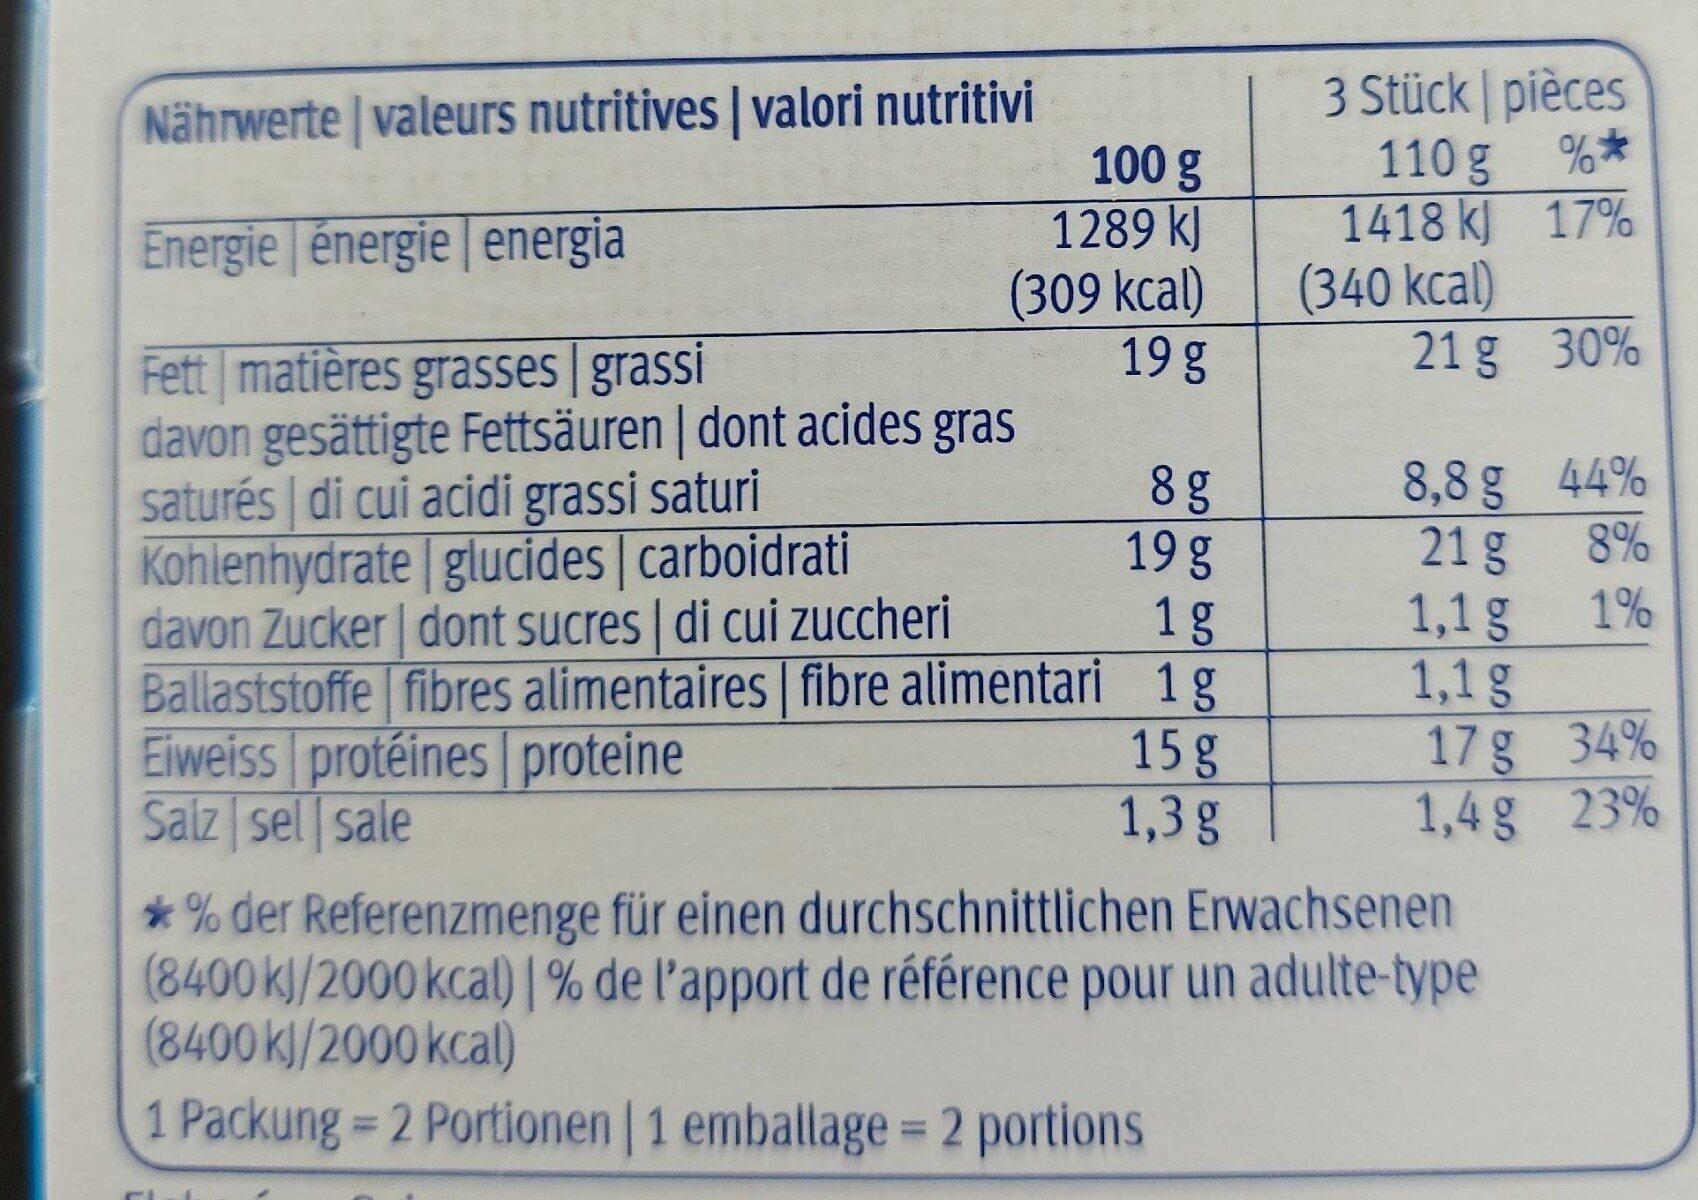 Mozzarella sticks - Valori nutrizionali - fr